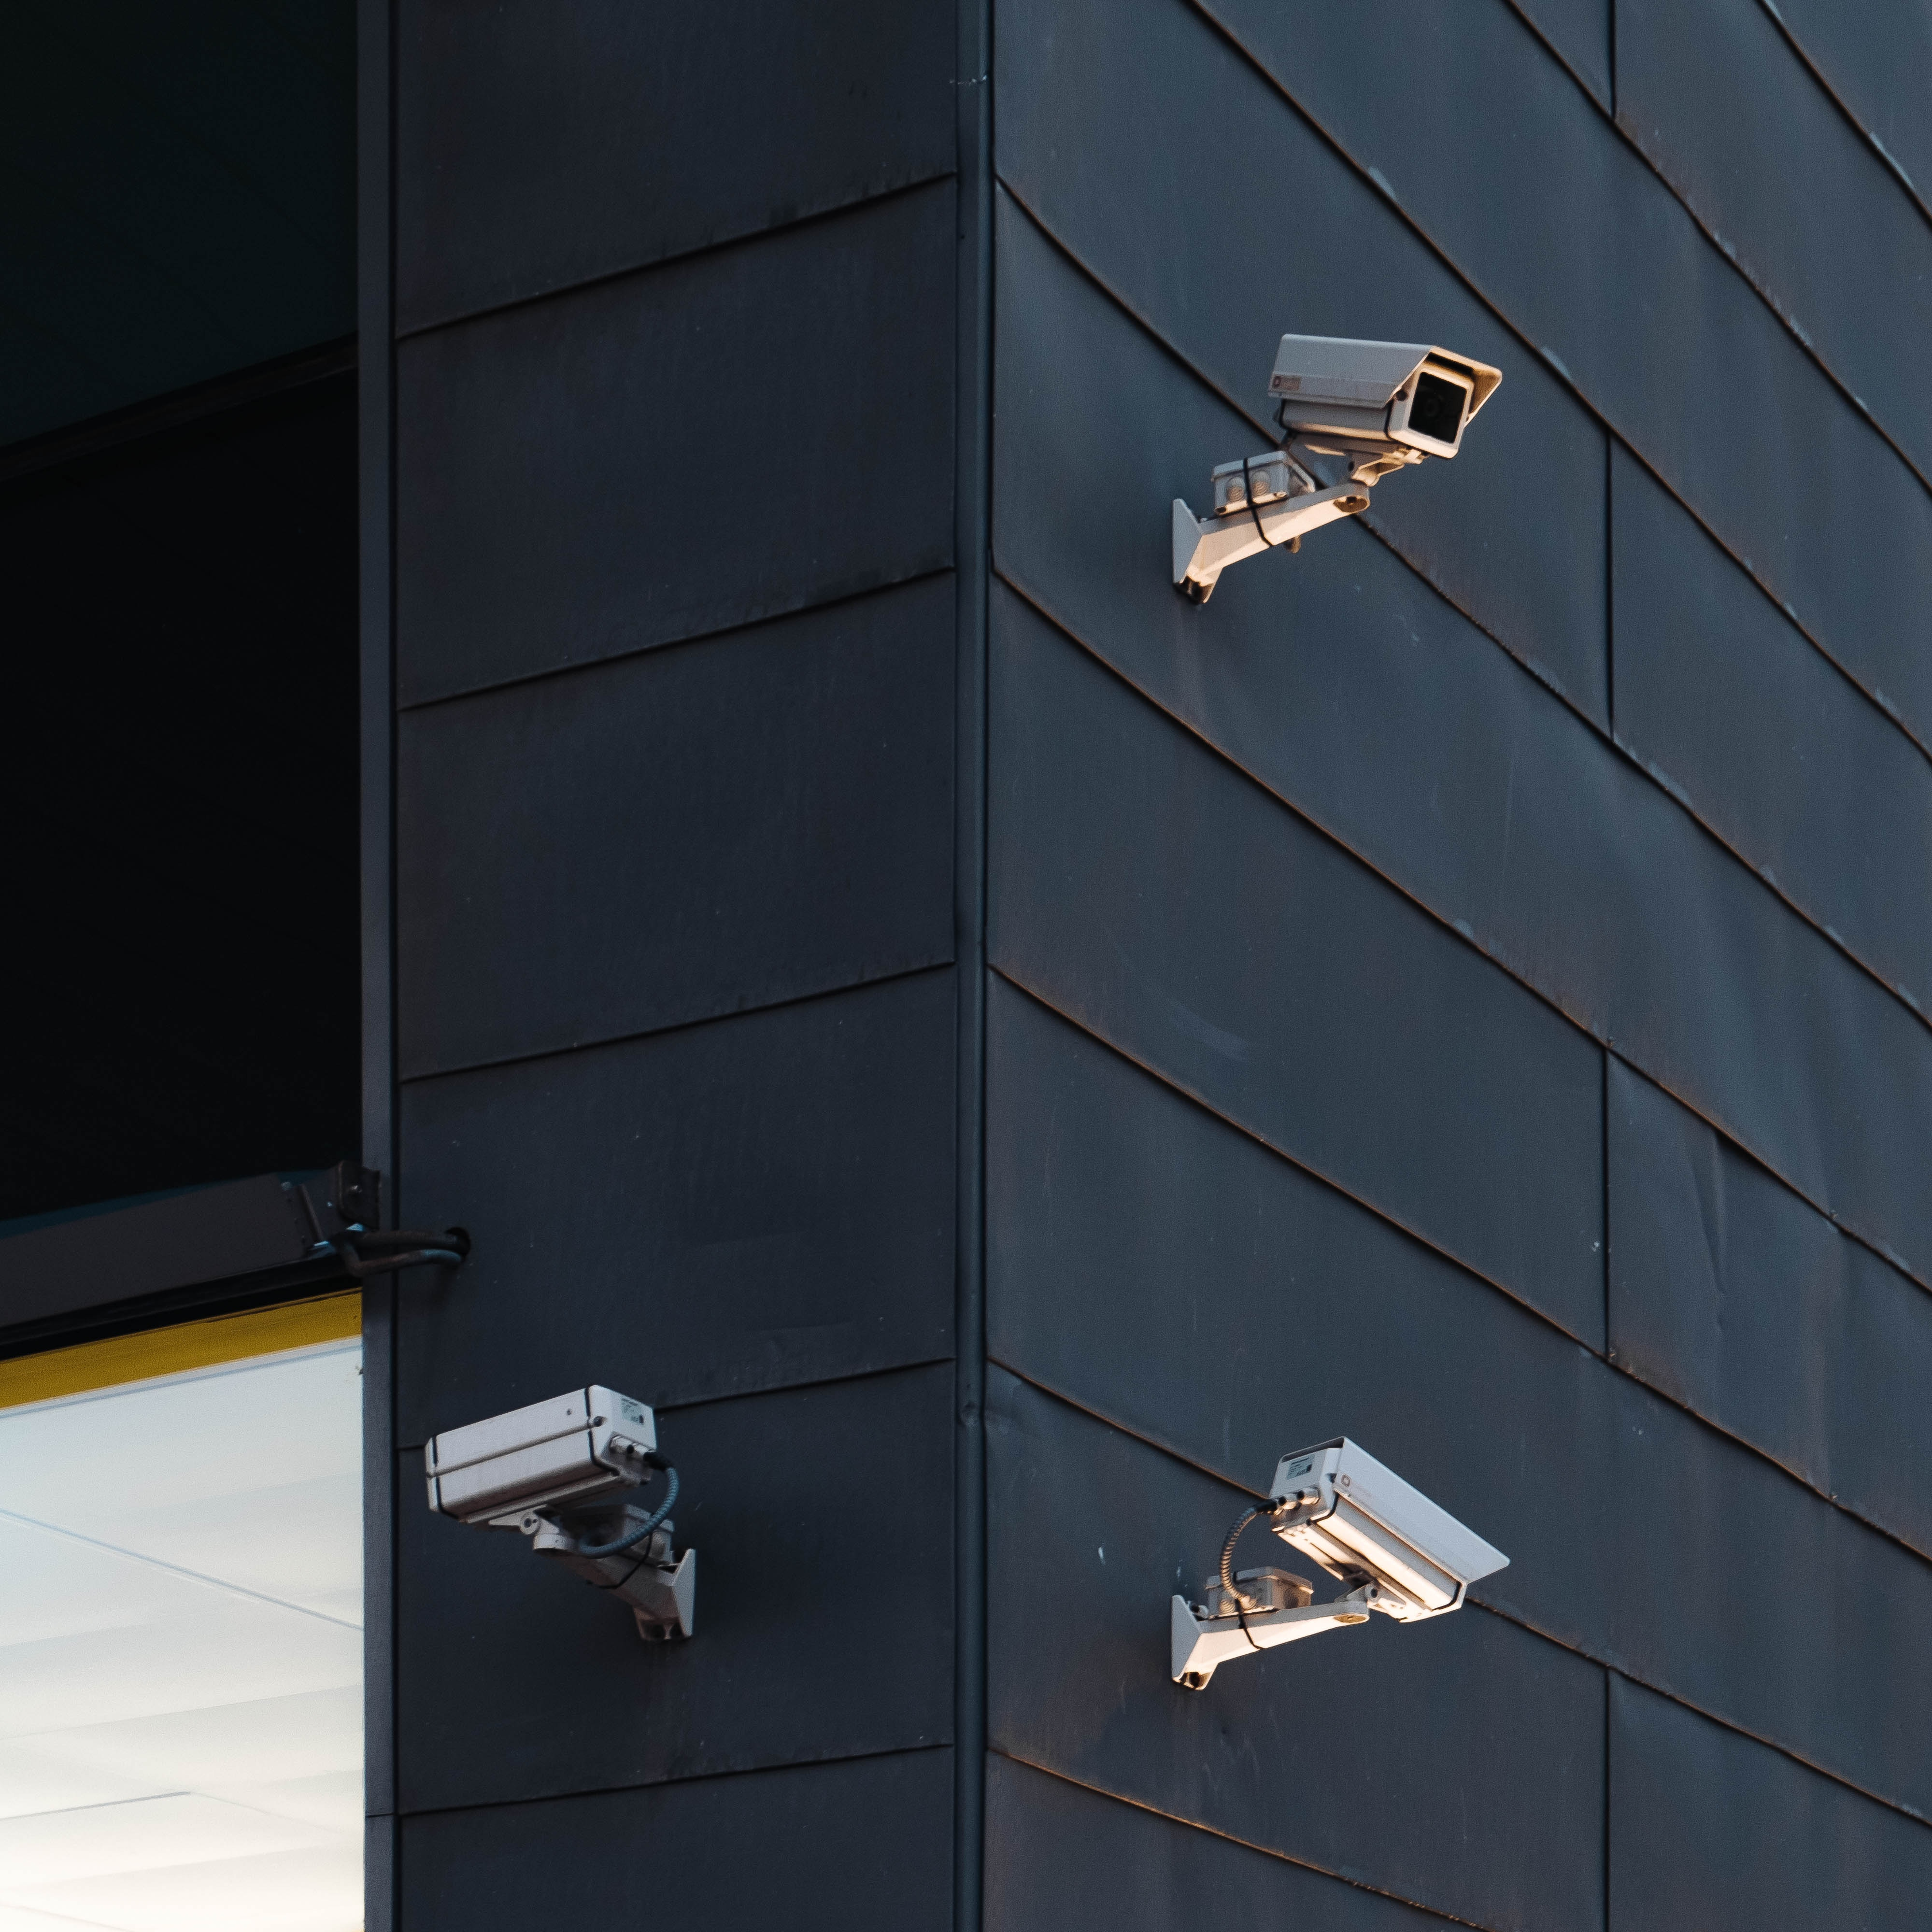 surveillance-cam